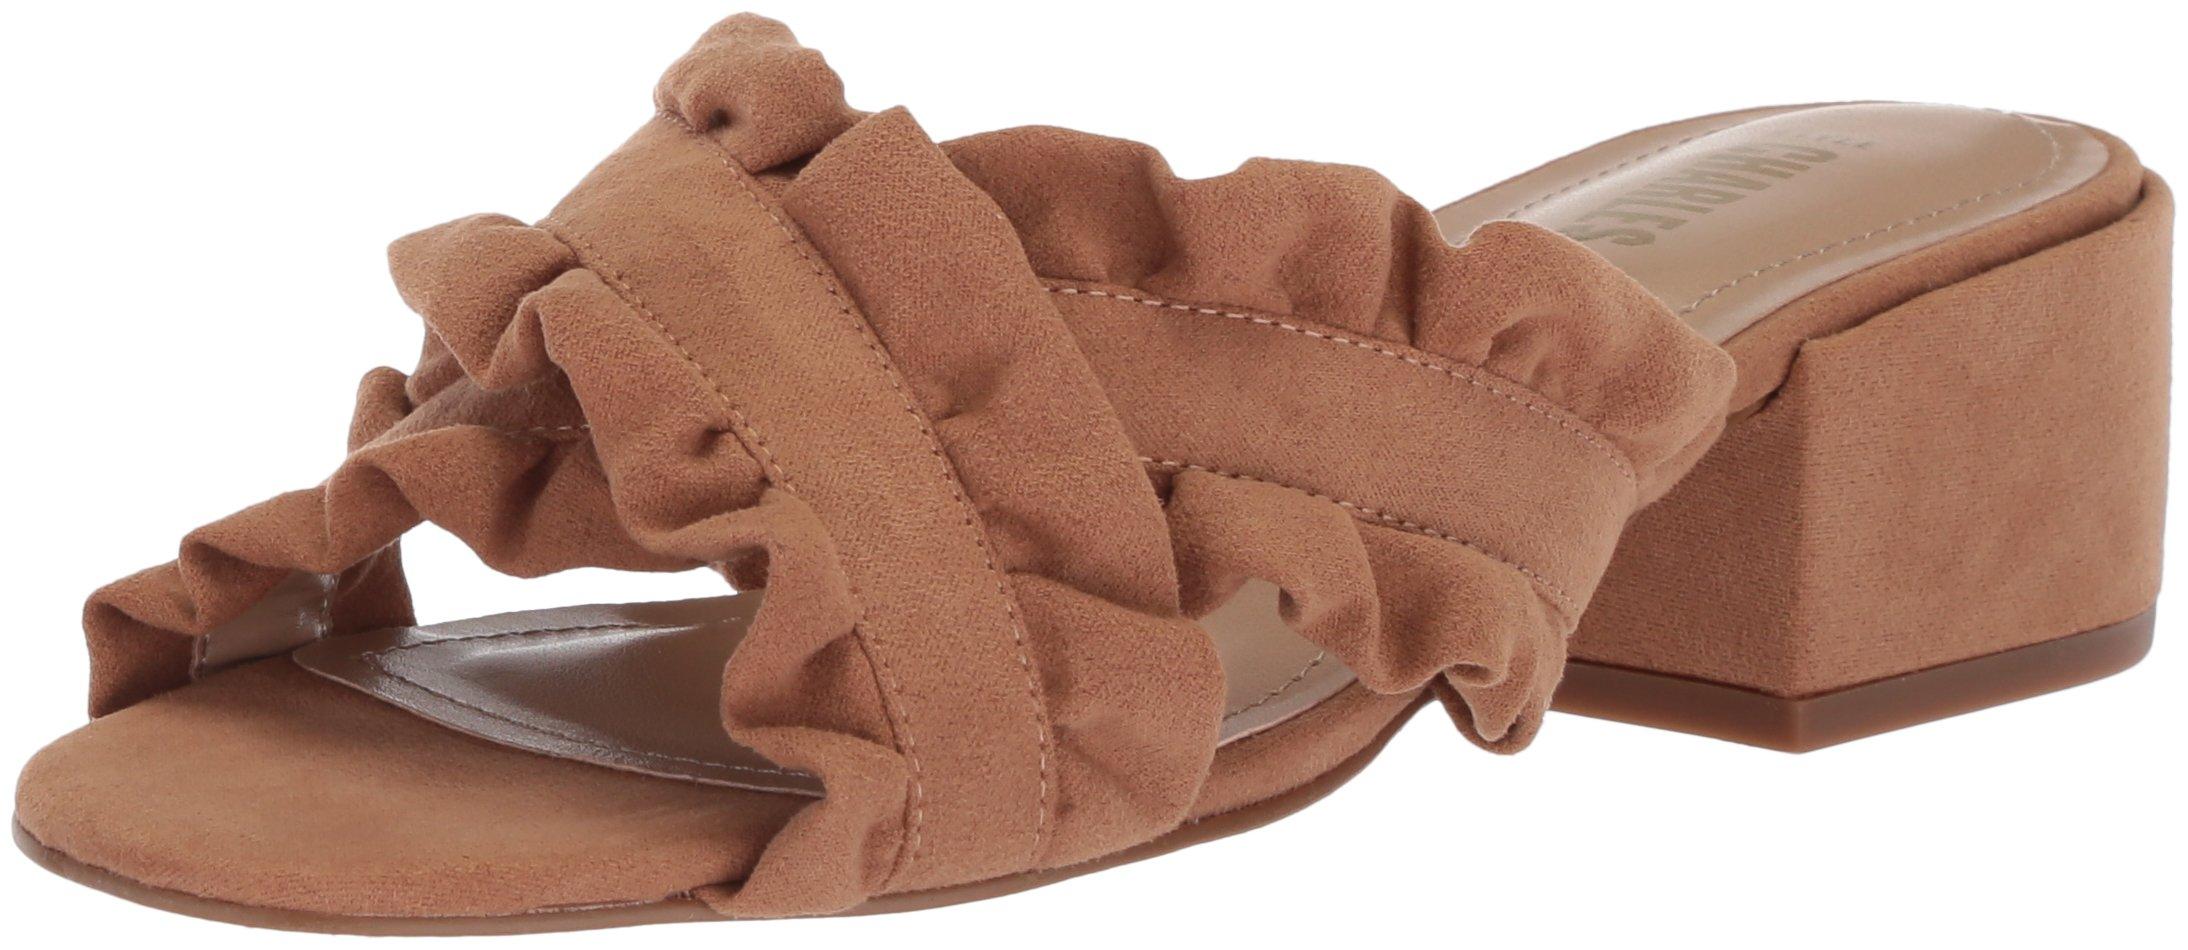 Style by Charles David Women's Vinny Slide Sandal, Desert Sand, 6 M US by Style by Charles David